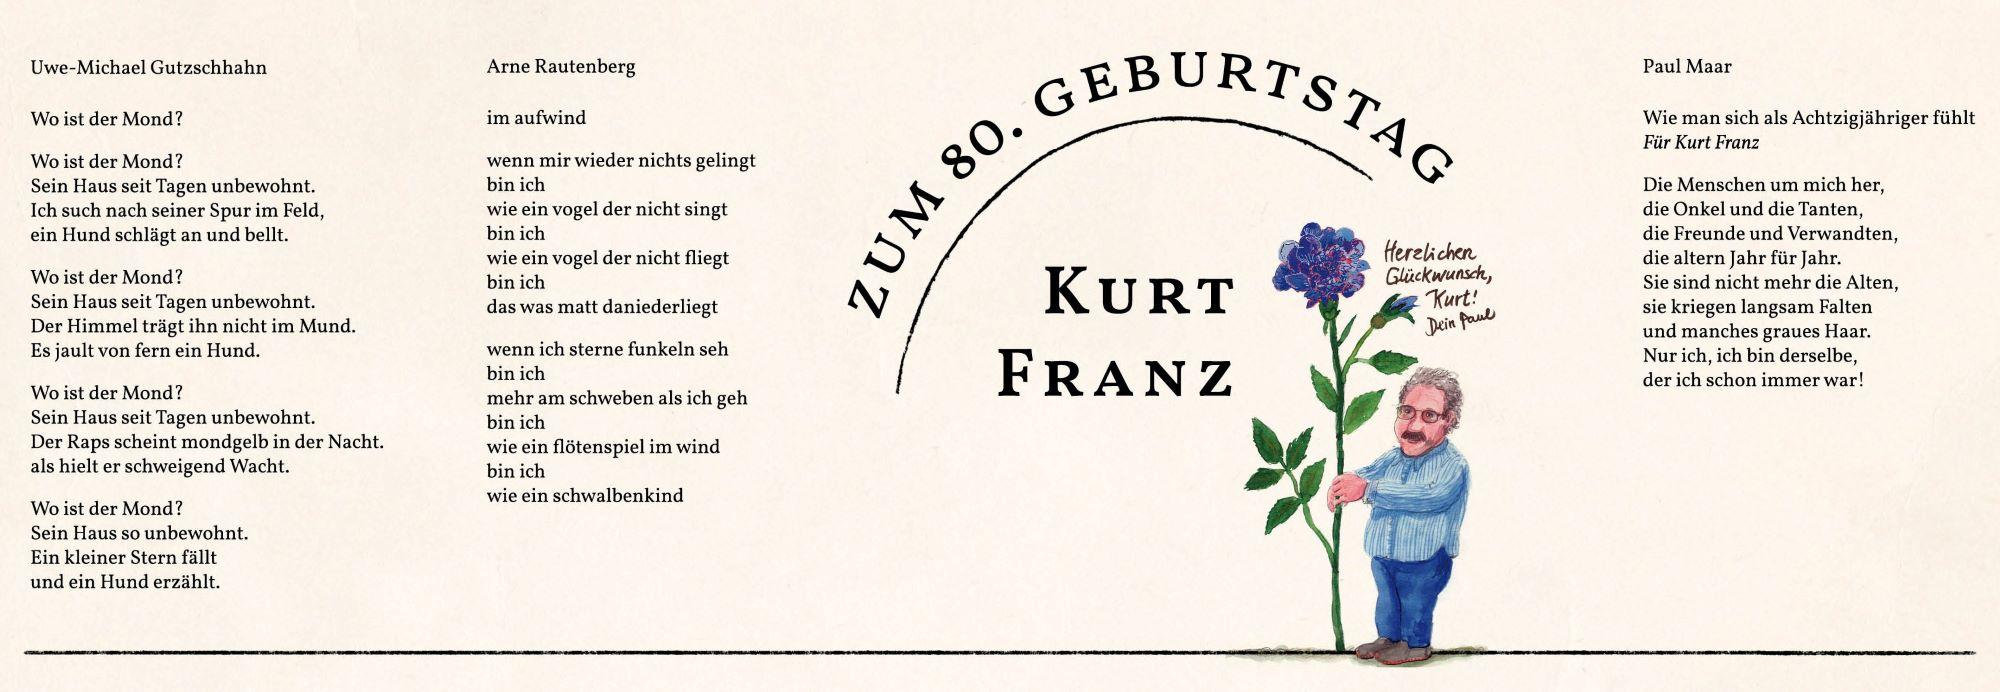 Geburstagsblatt: Kurt Franz zum 80. Geburtstag